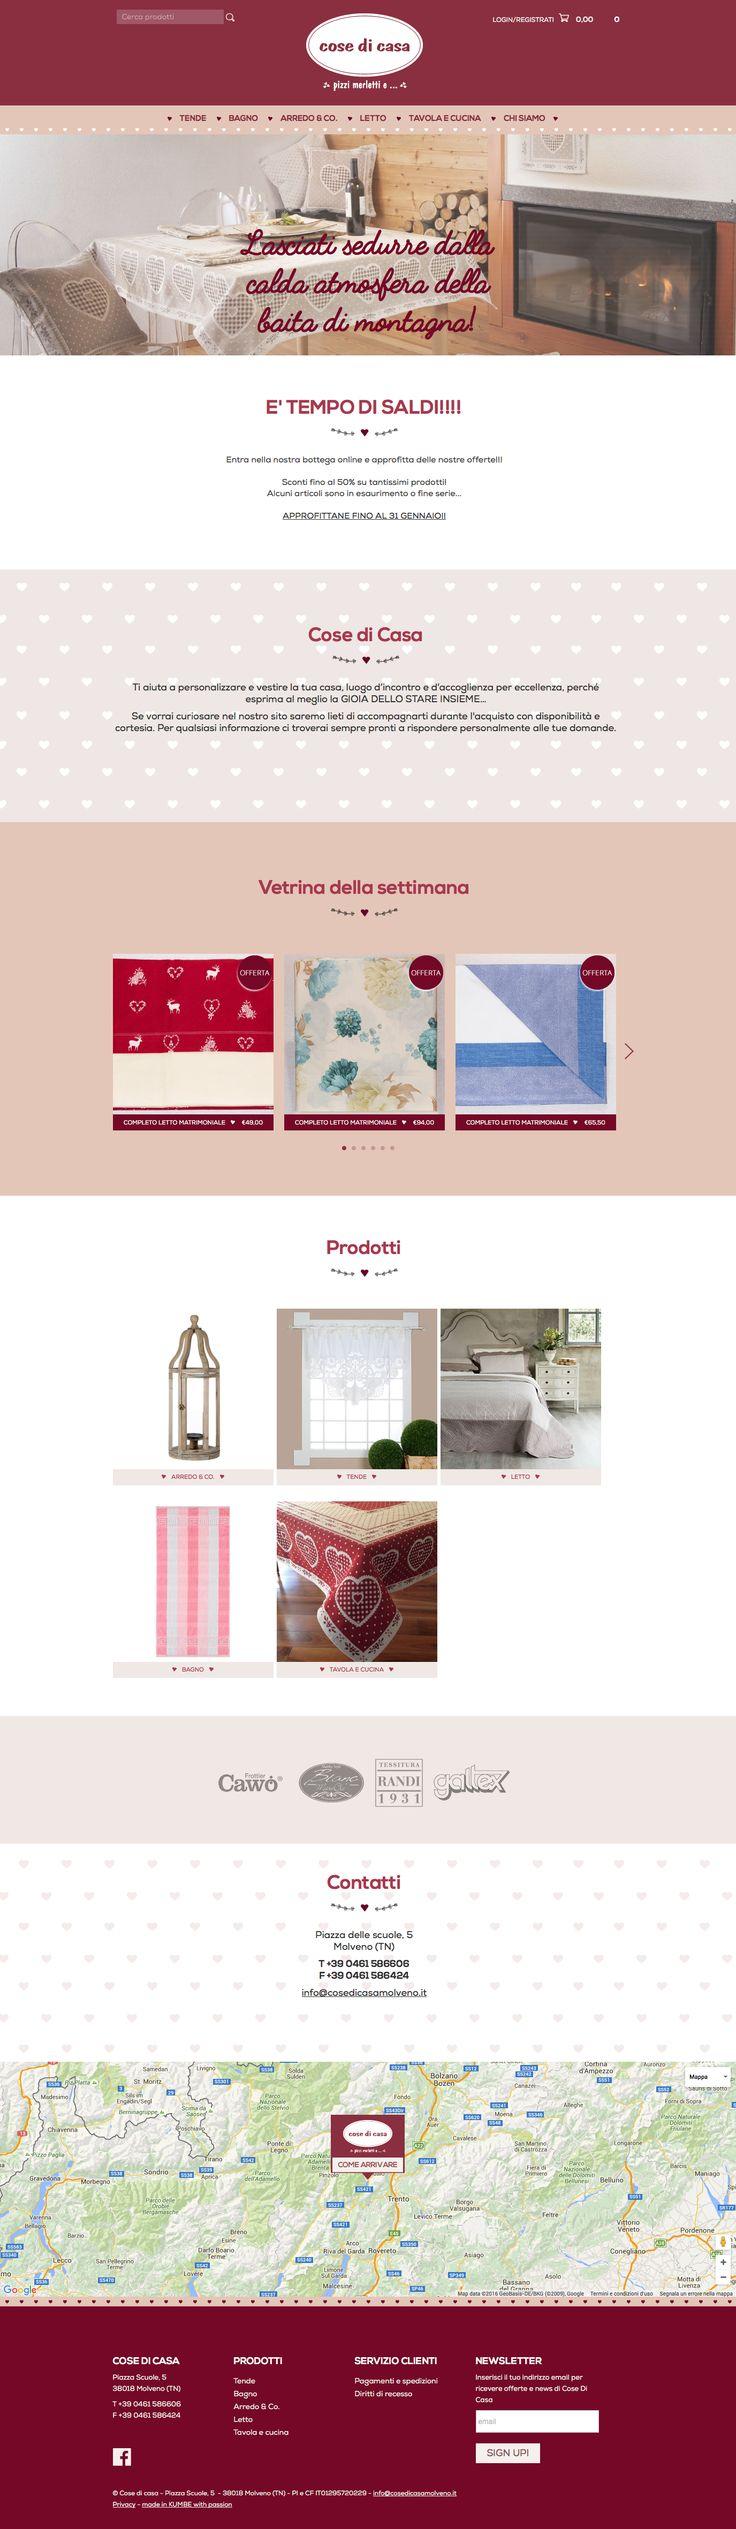 #cosedicasamolveno www.cosedicasamolveno.it #Kumbe #portfolioweb #webdesign #website #responsivedesign #responsive #ecommerce #shop #casa #home #love #tessuti #cuore #tende #tovaglia #homedecor #shabby #molveno #trentino